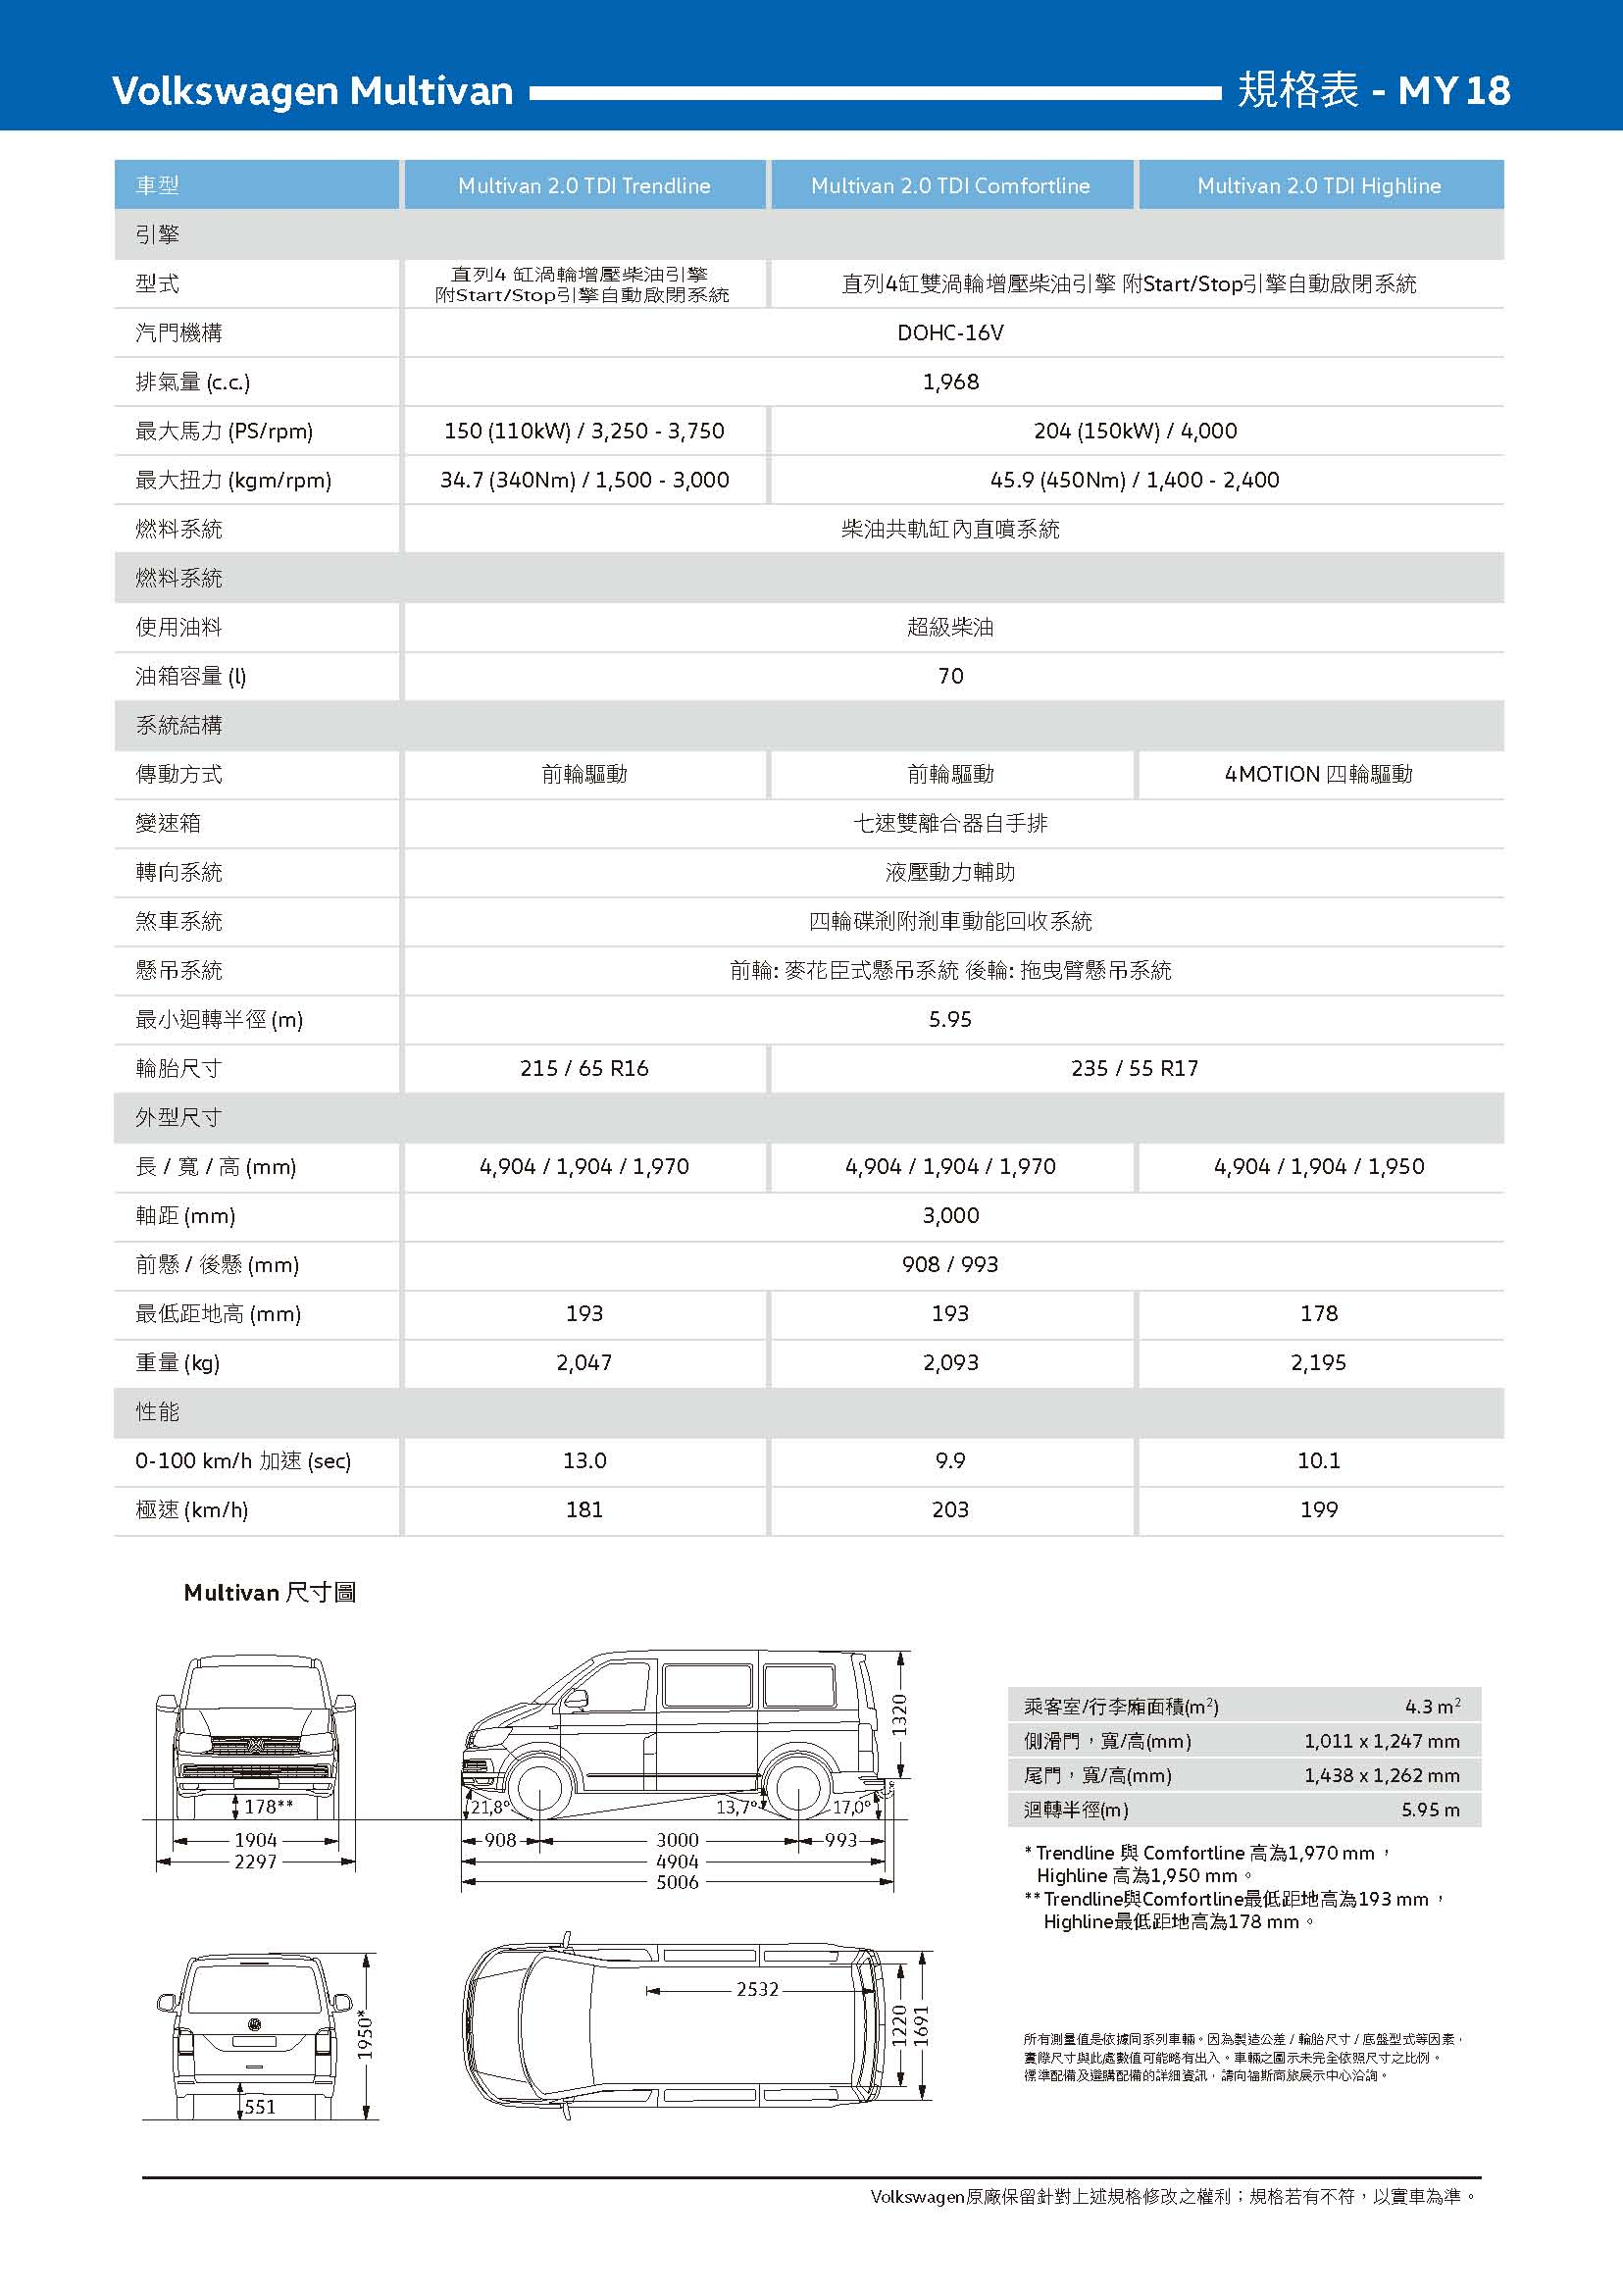 MY18_Multivan規配表-20171120-Final_頁面_4